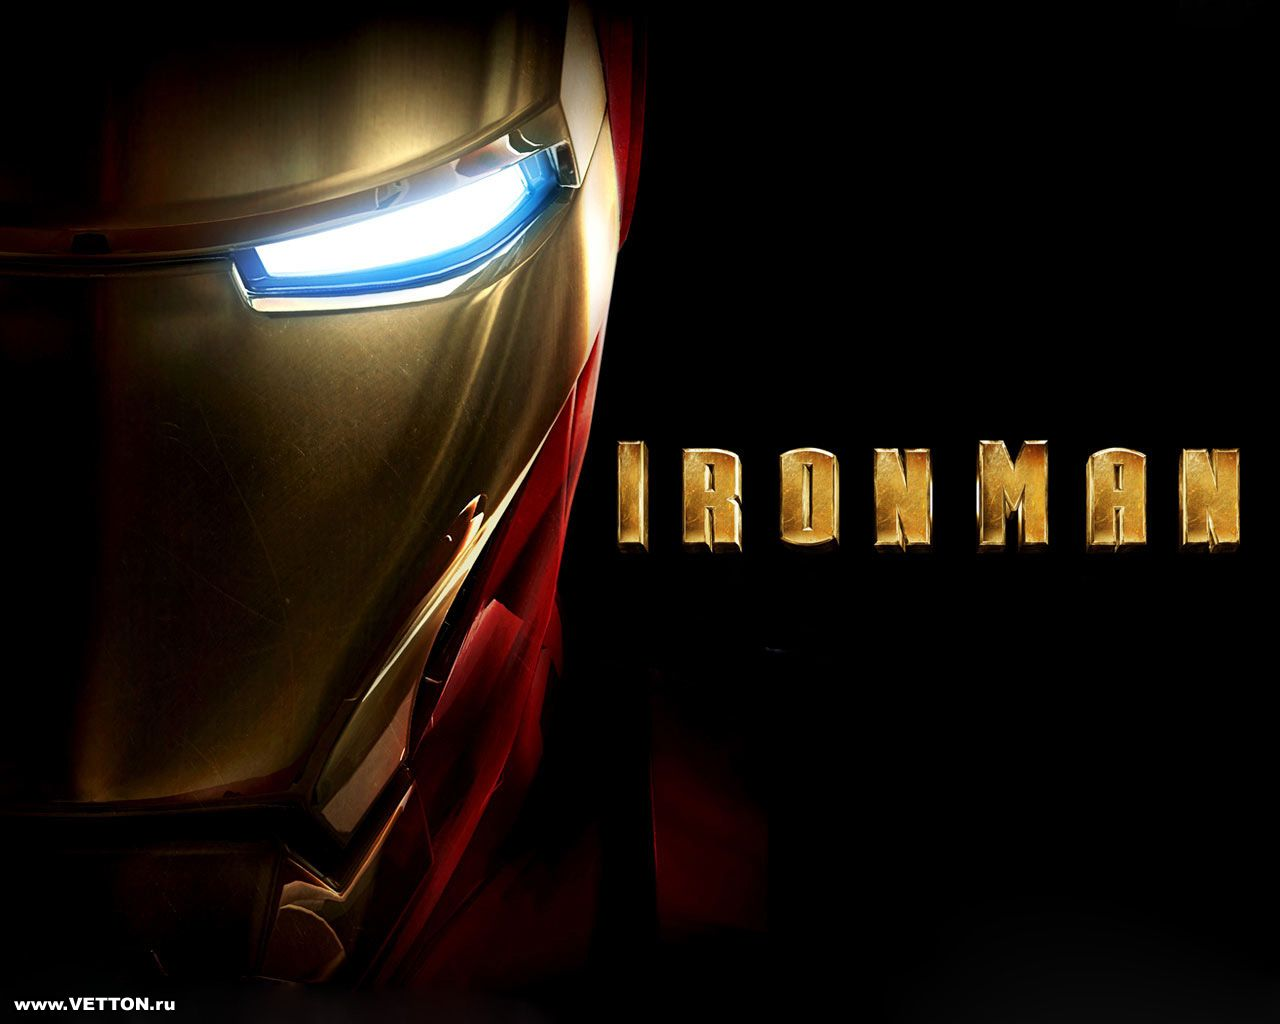 Iron Man Wallpaper E Entertainment 1280x1024